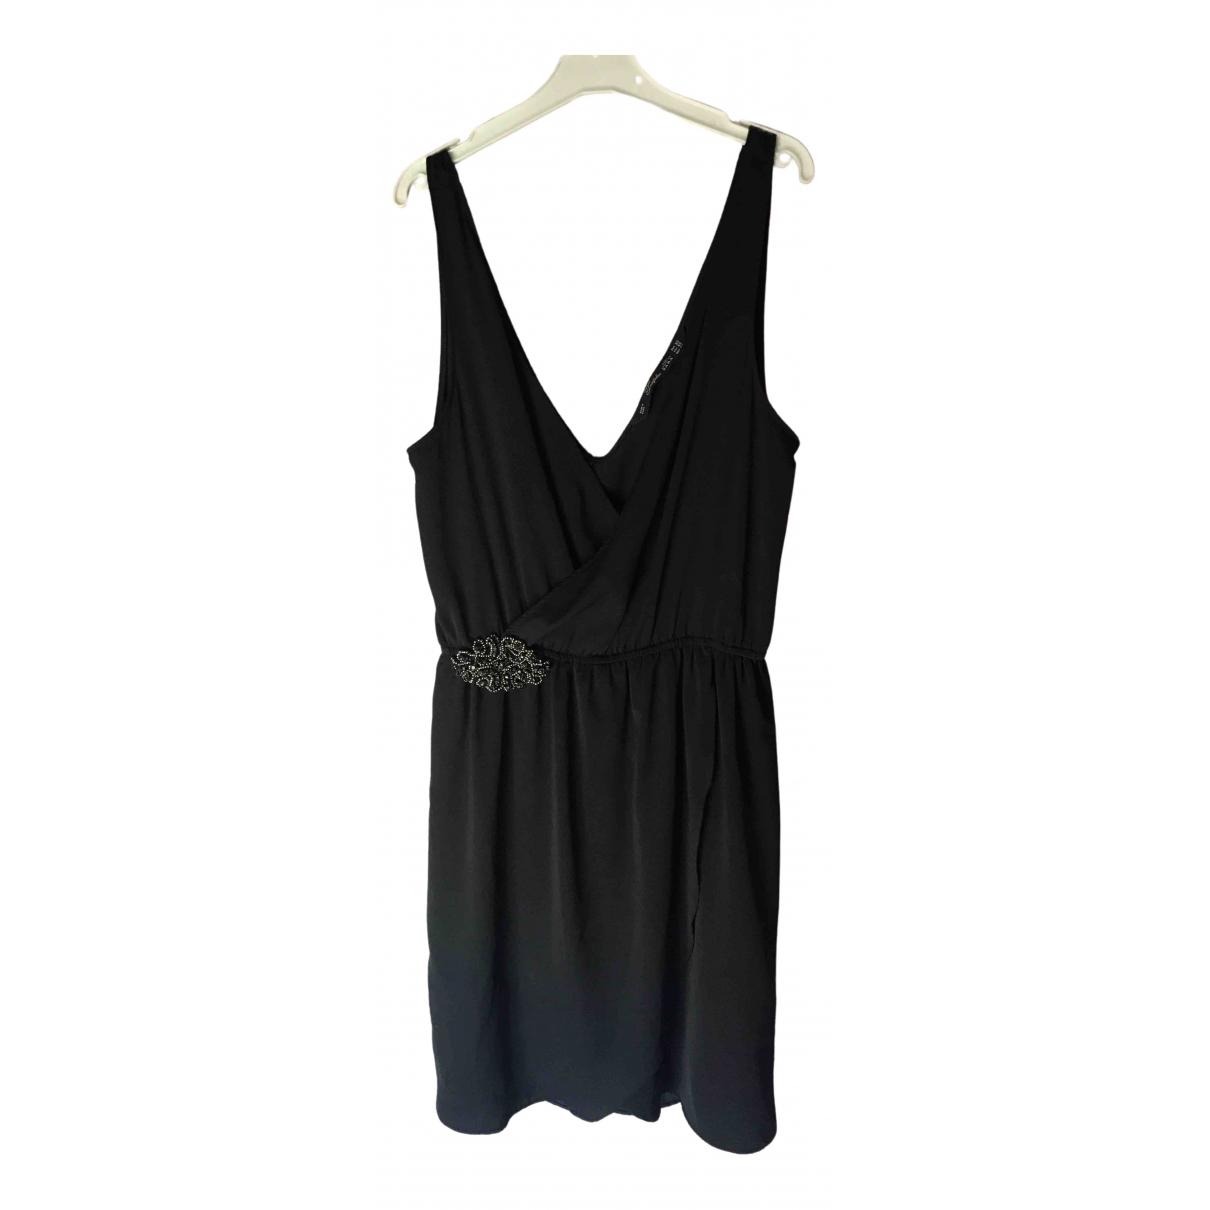 Zara \N Black dress for Women XS International